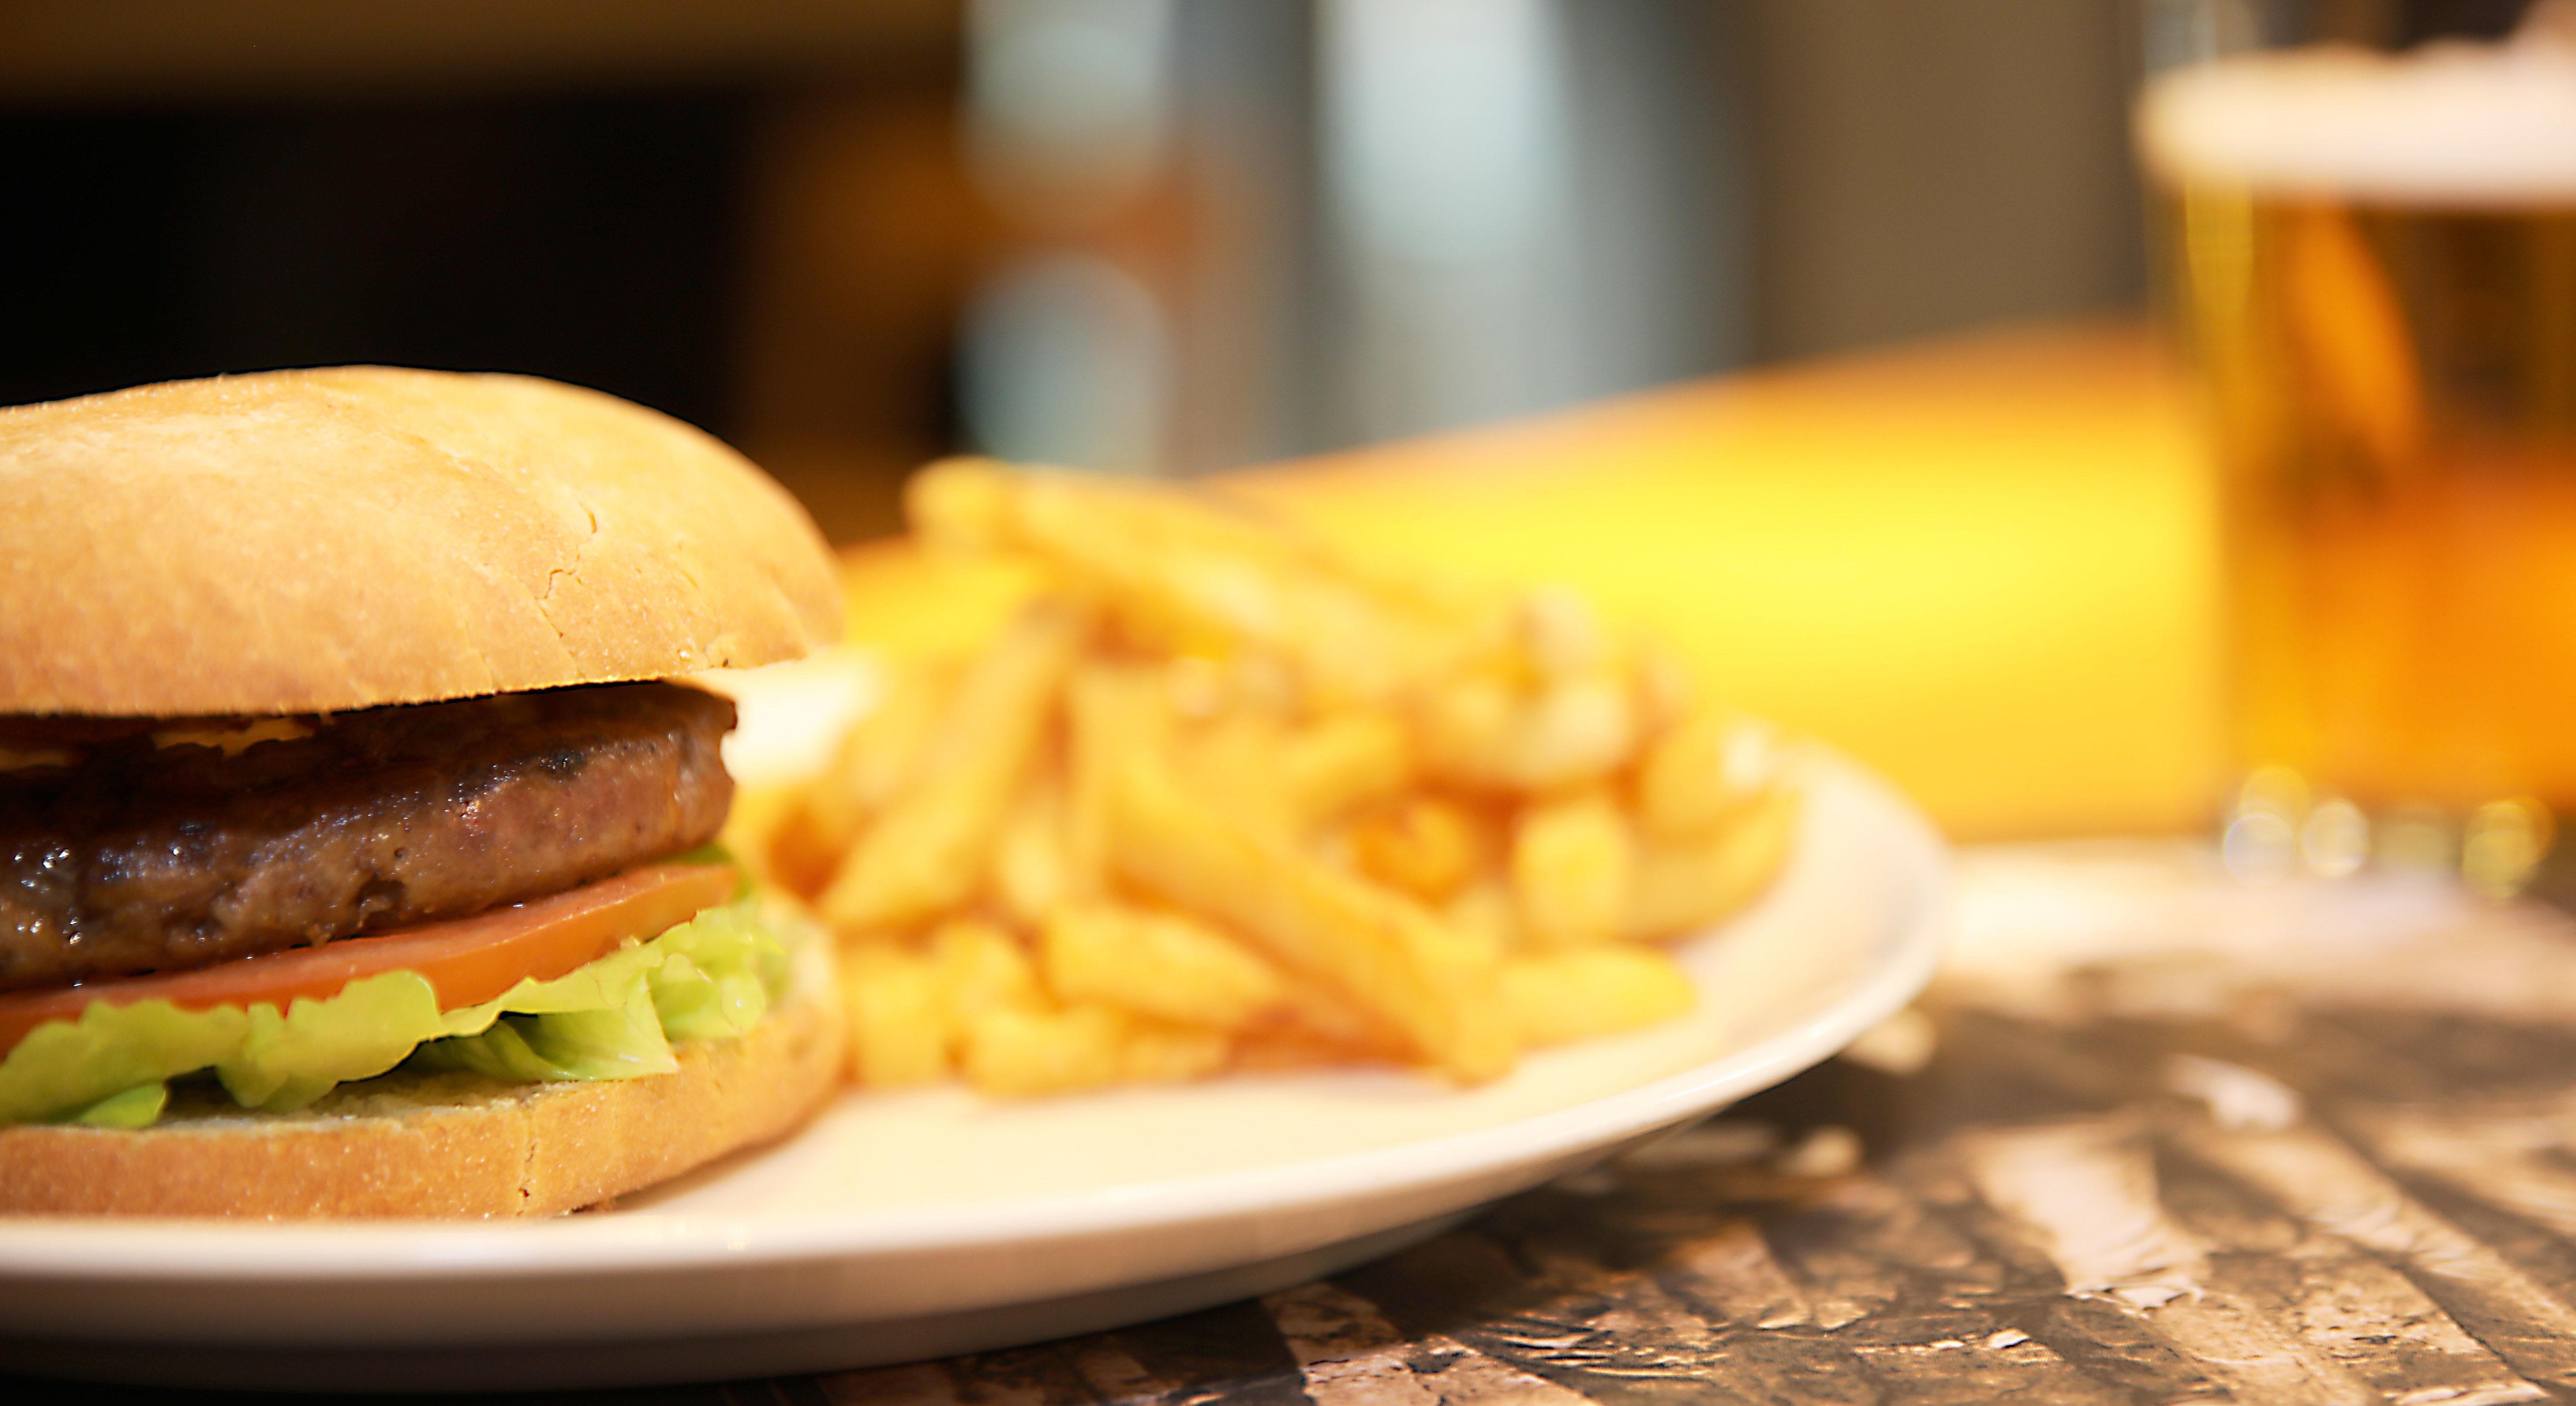 promo-burguer-promoburguer-hamburguesa-patatas-cerveza-bebida-comida